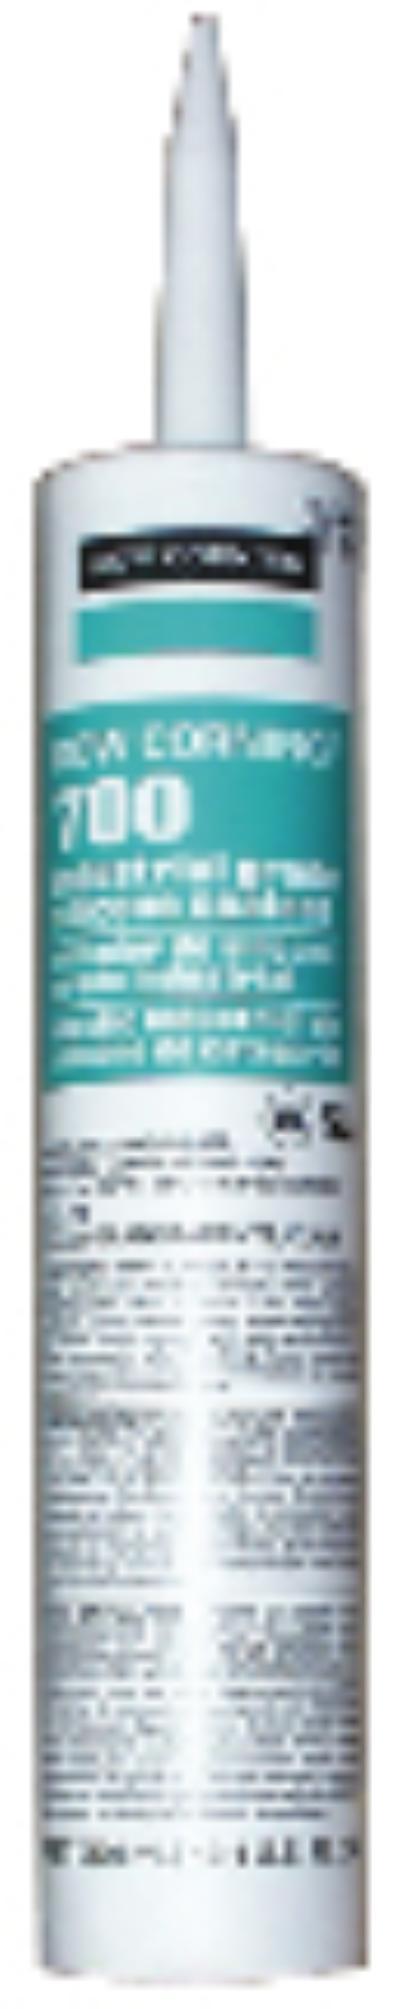 10.1oz Cartridge 700 Silicone Sealants